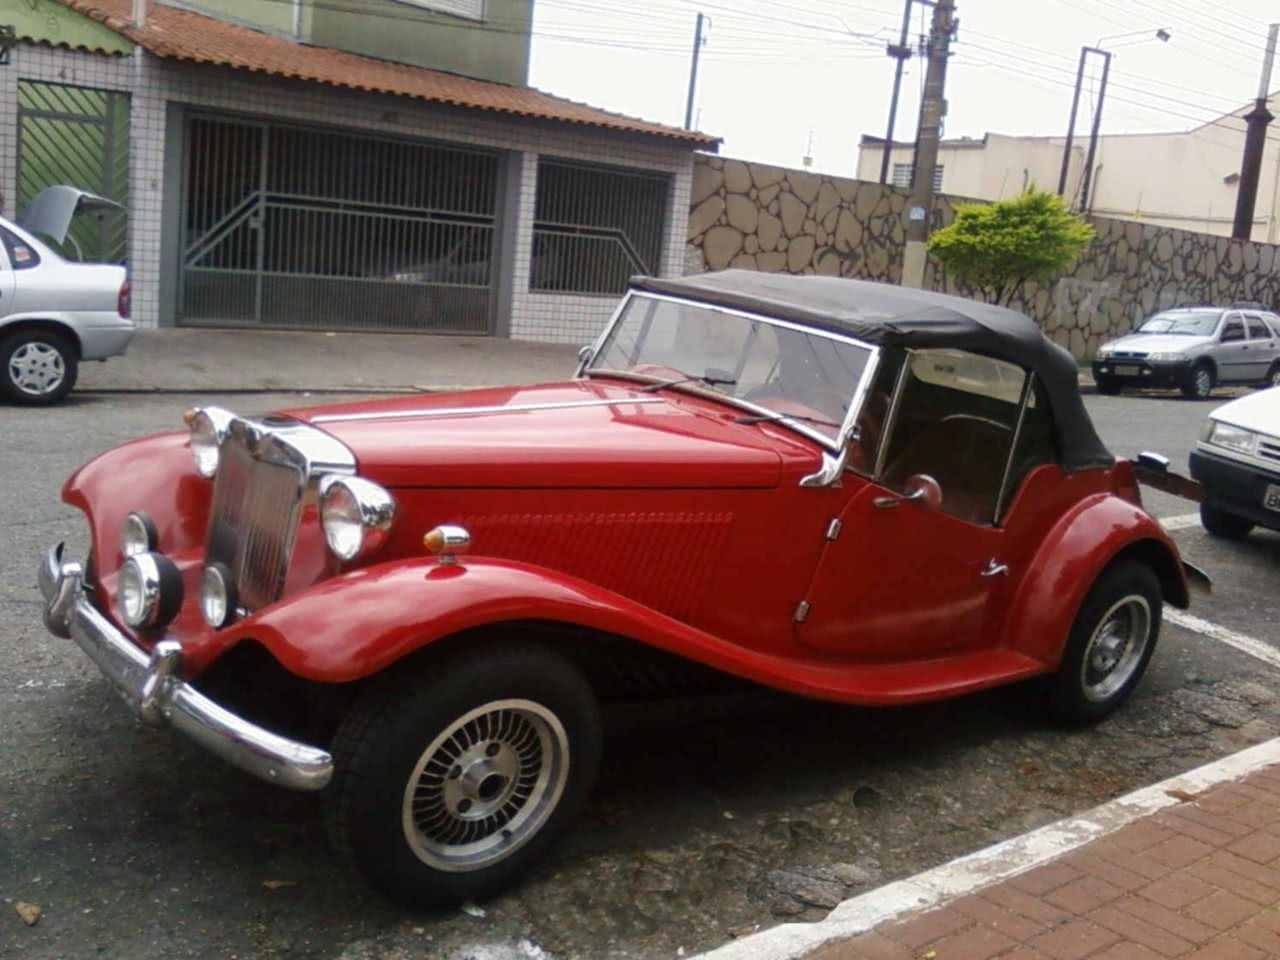 Revenda Vw Fechada in addition Gtaiv likewise Calhambeque Foto further Px Golmk also V E. on volkswagen brasilia